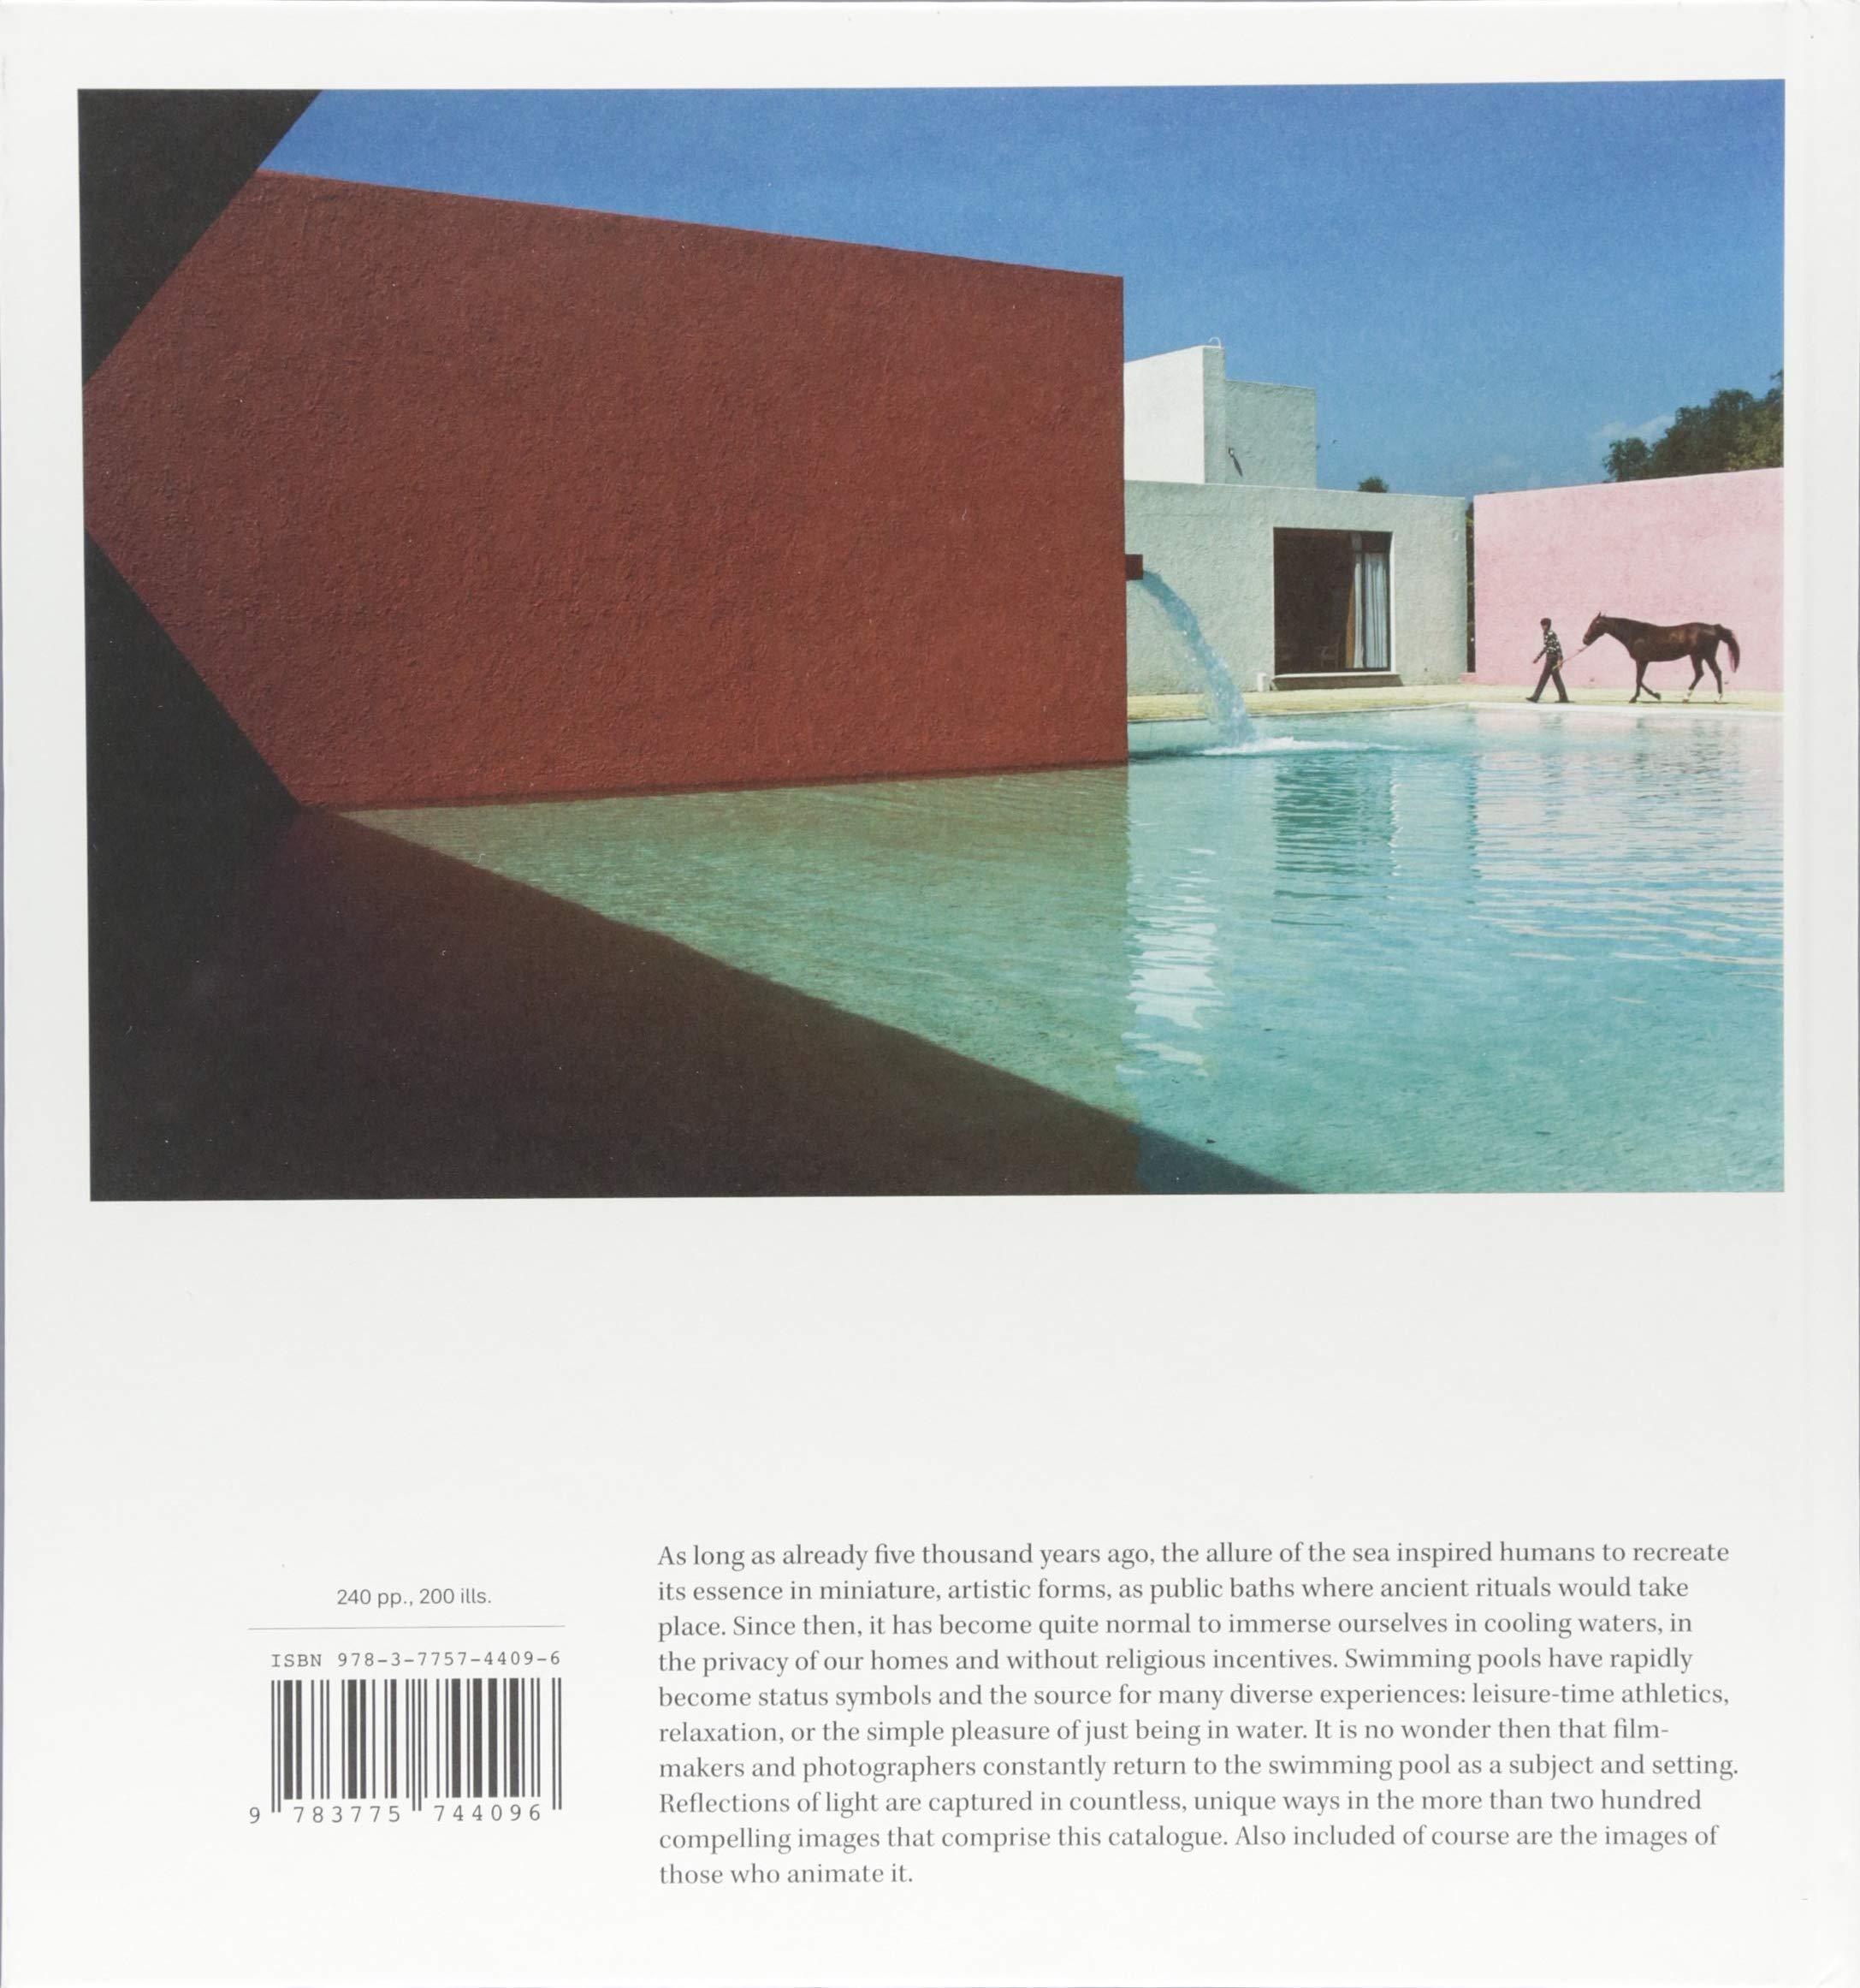 The Swimming Pool in Photography: Amazon.es: Francis Hodgson: Libros en idiomas extranjeros